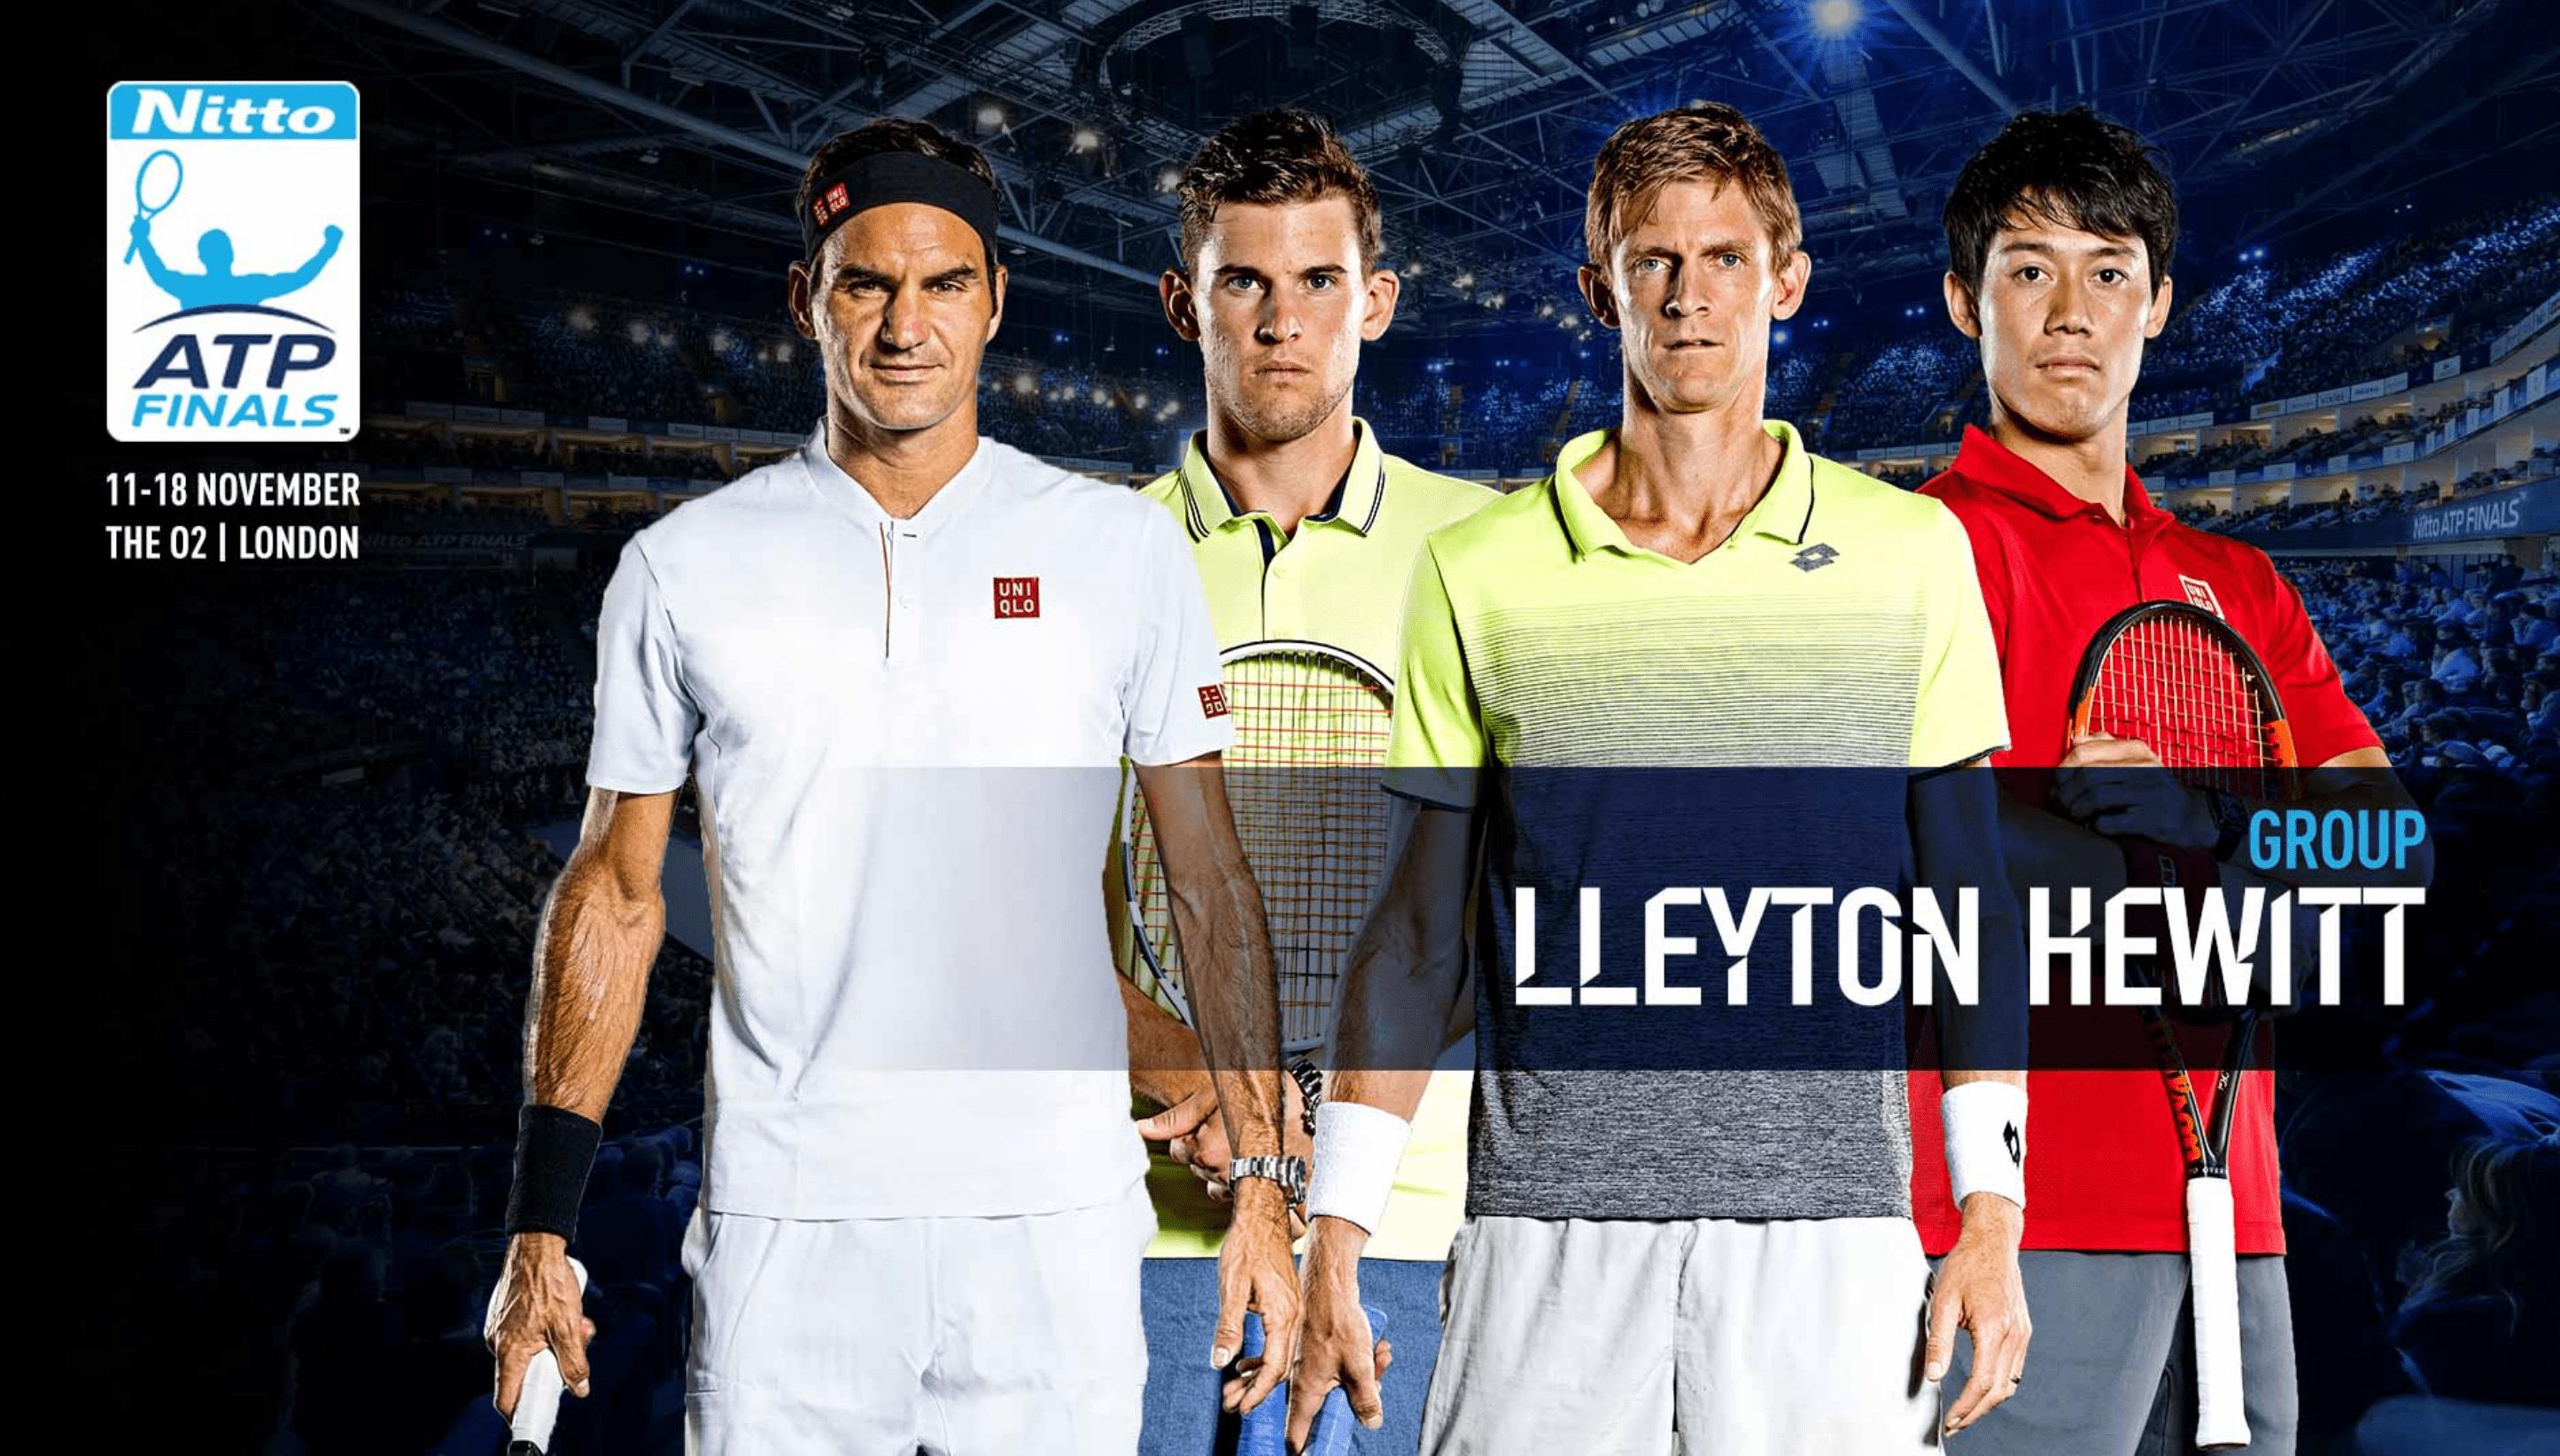 Gruppo-Lleyton-Hewitt-ATP-Finals-2018